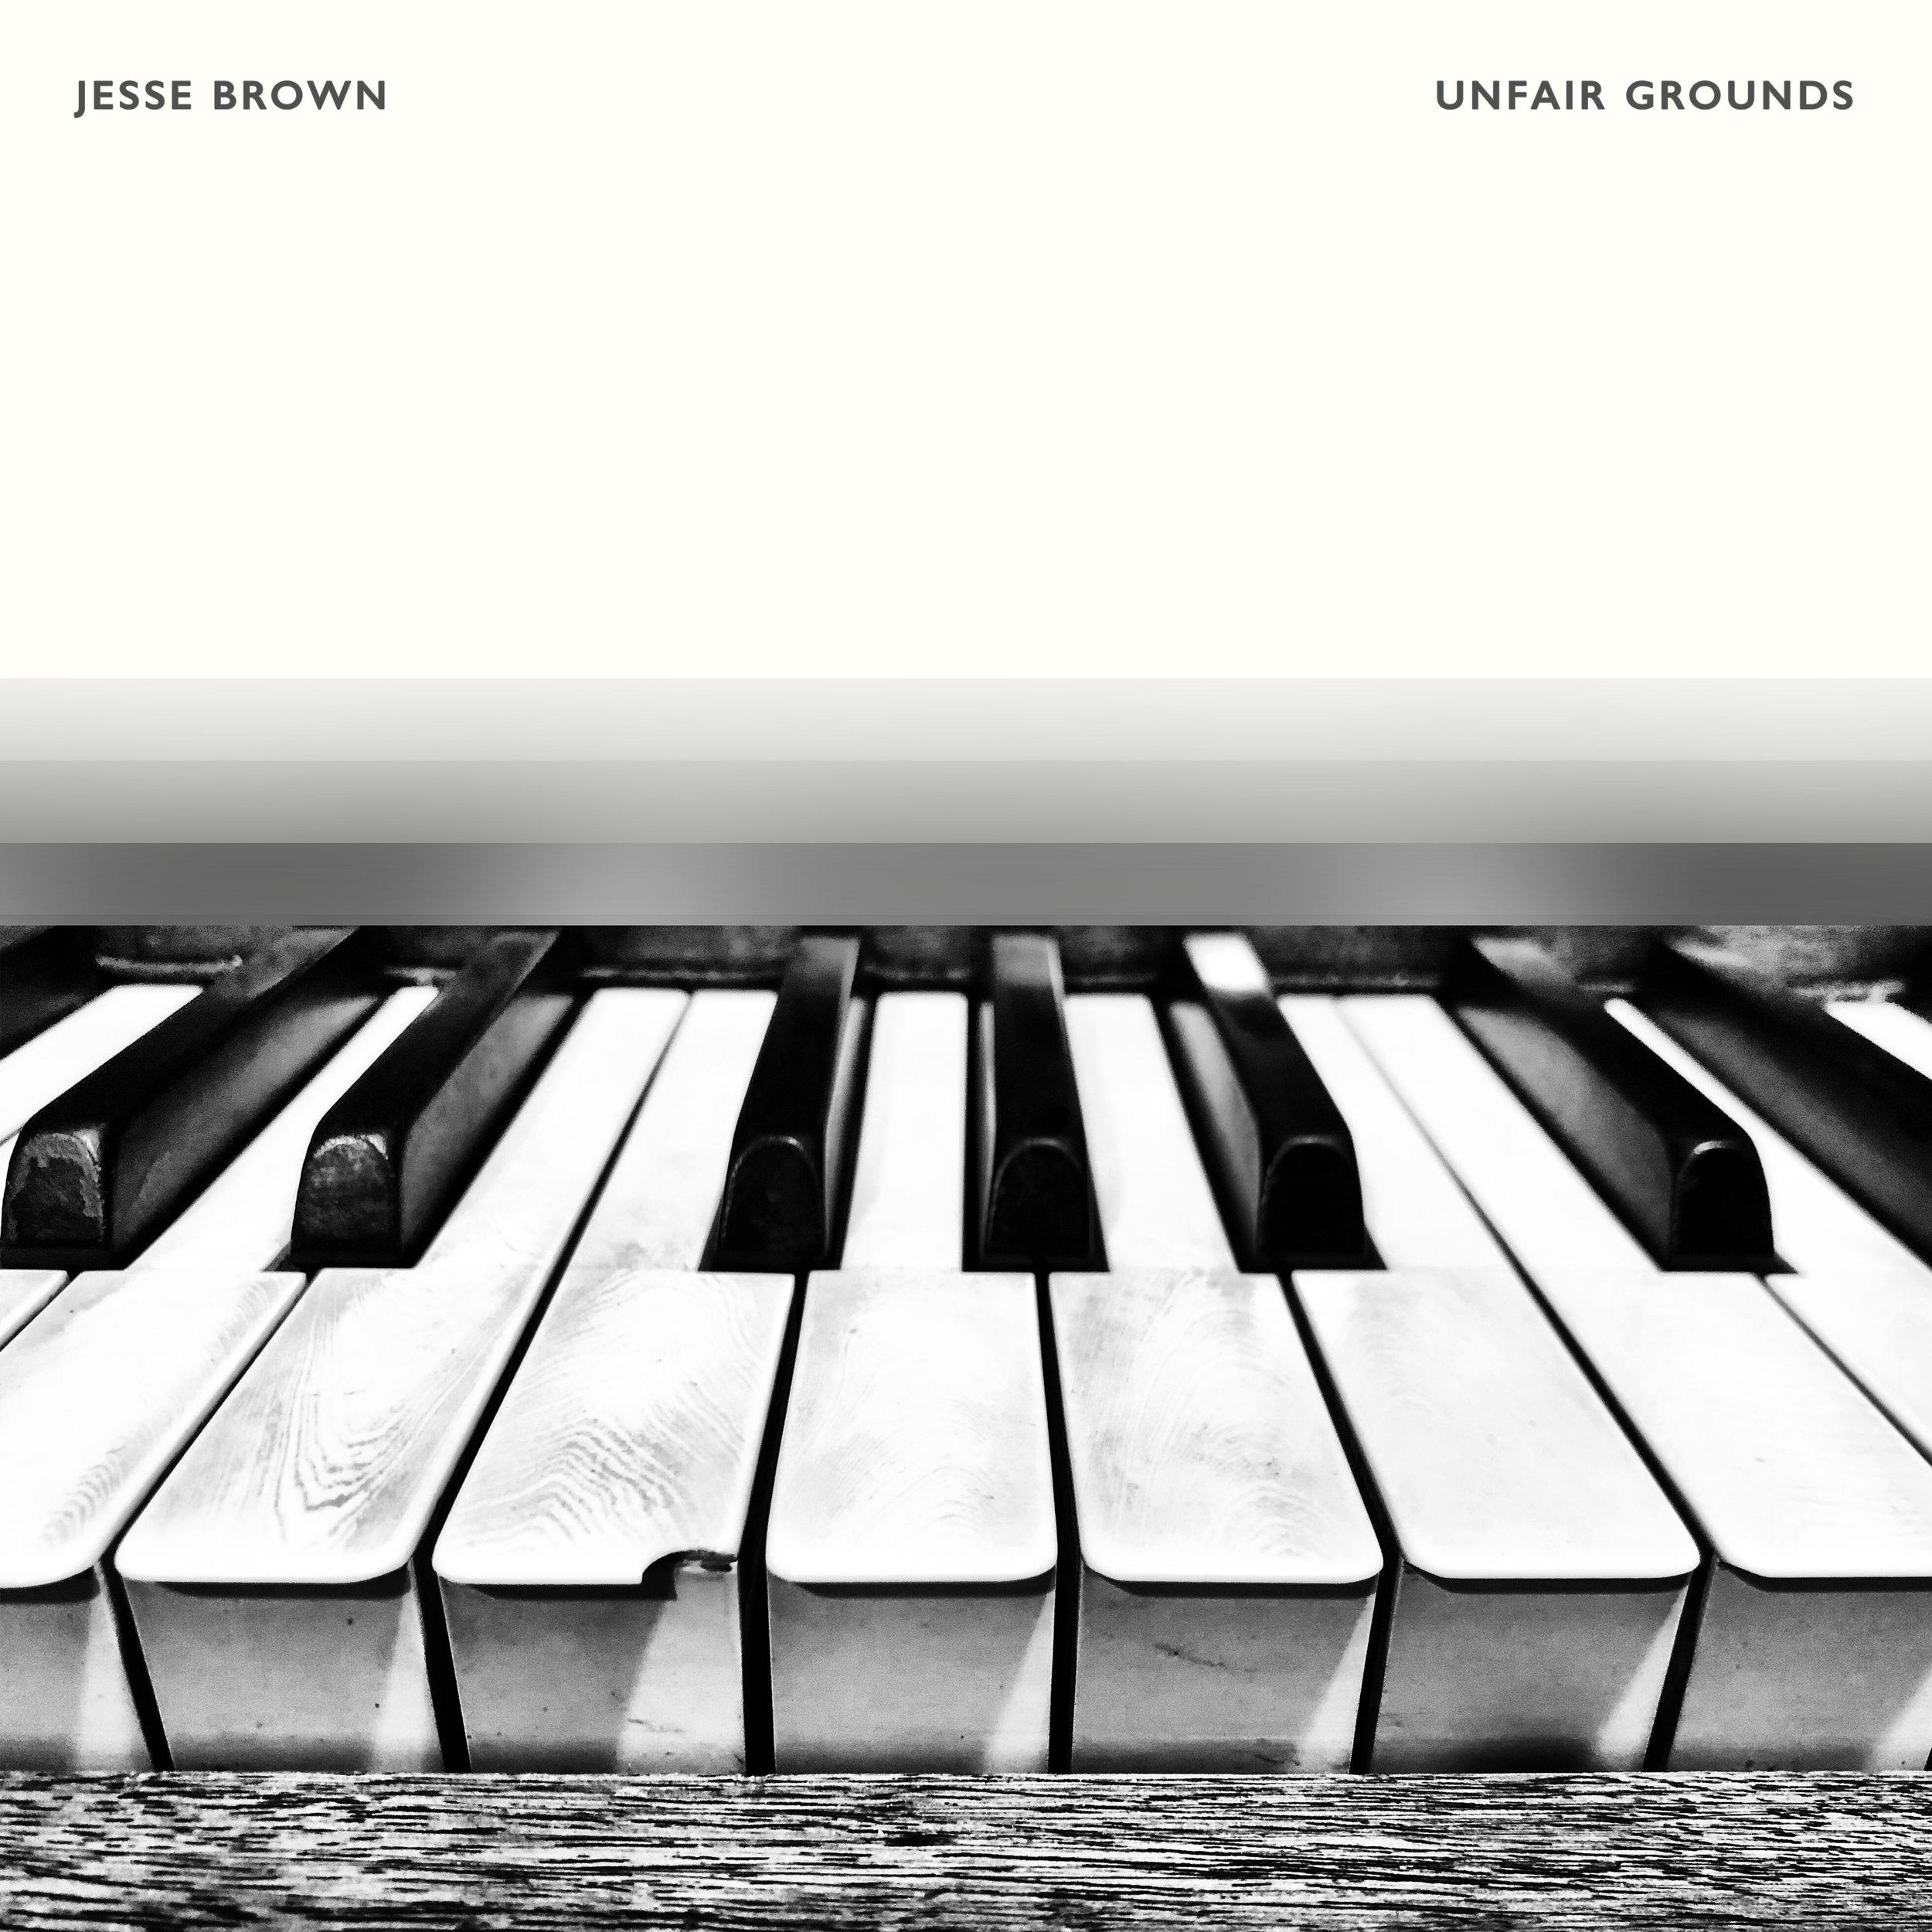 Jesse Brown - Unfair Grounds